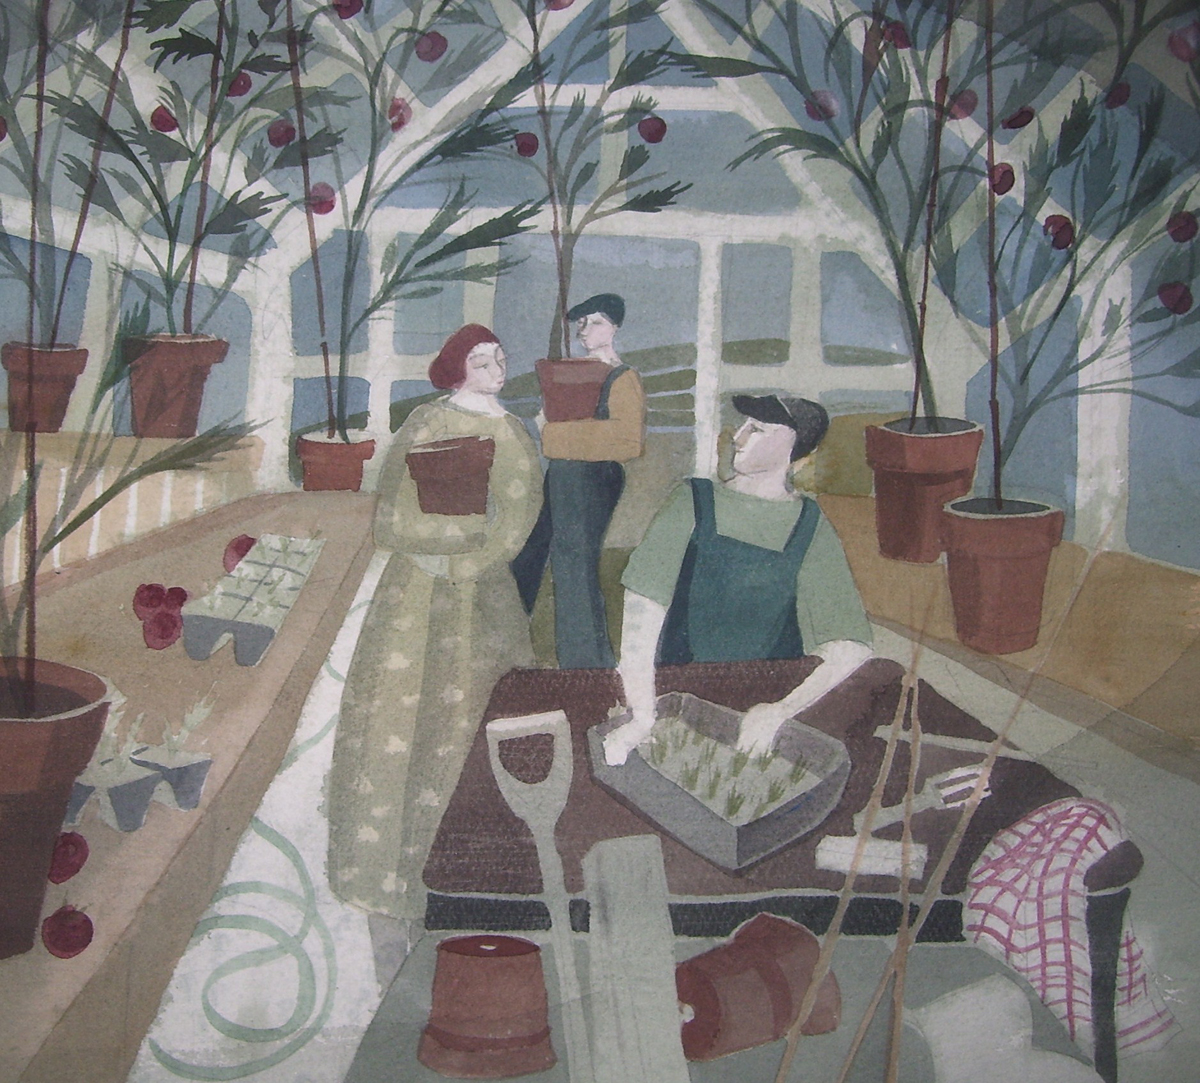 Green Fingers by Madeleine Hand